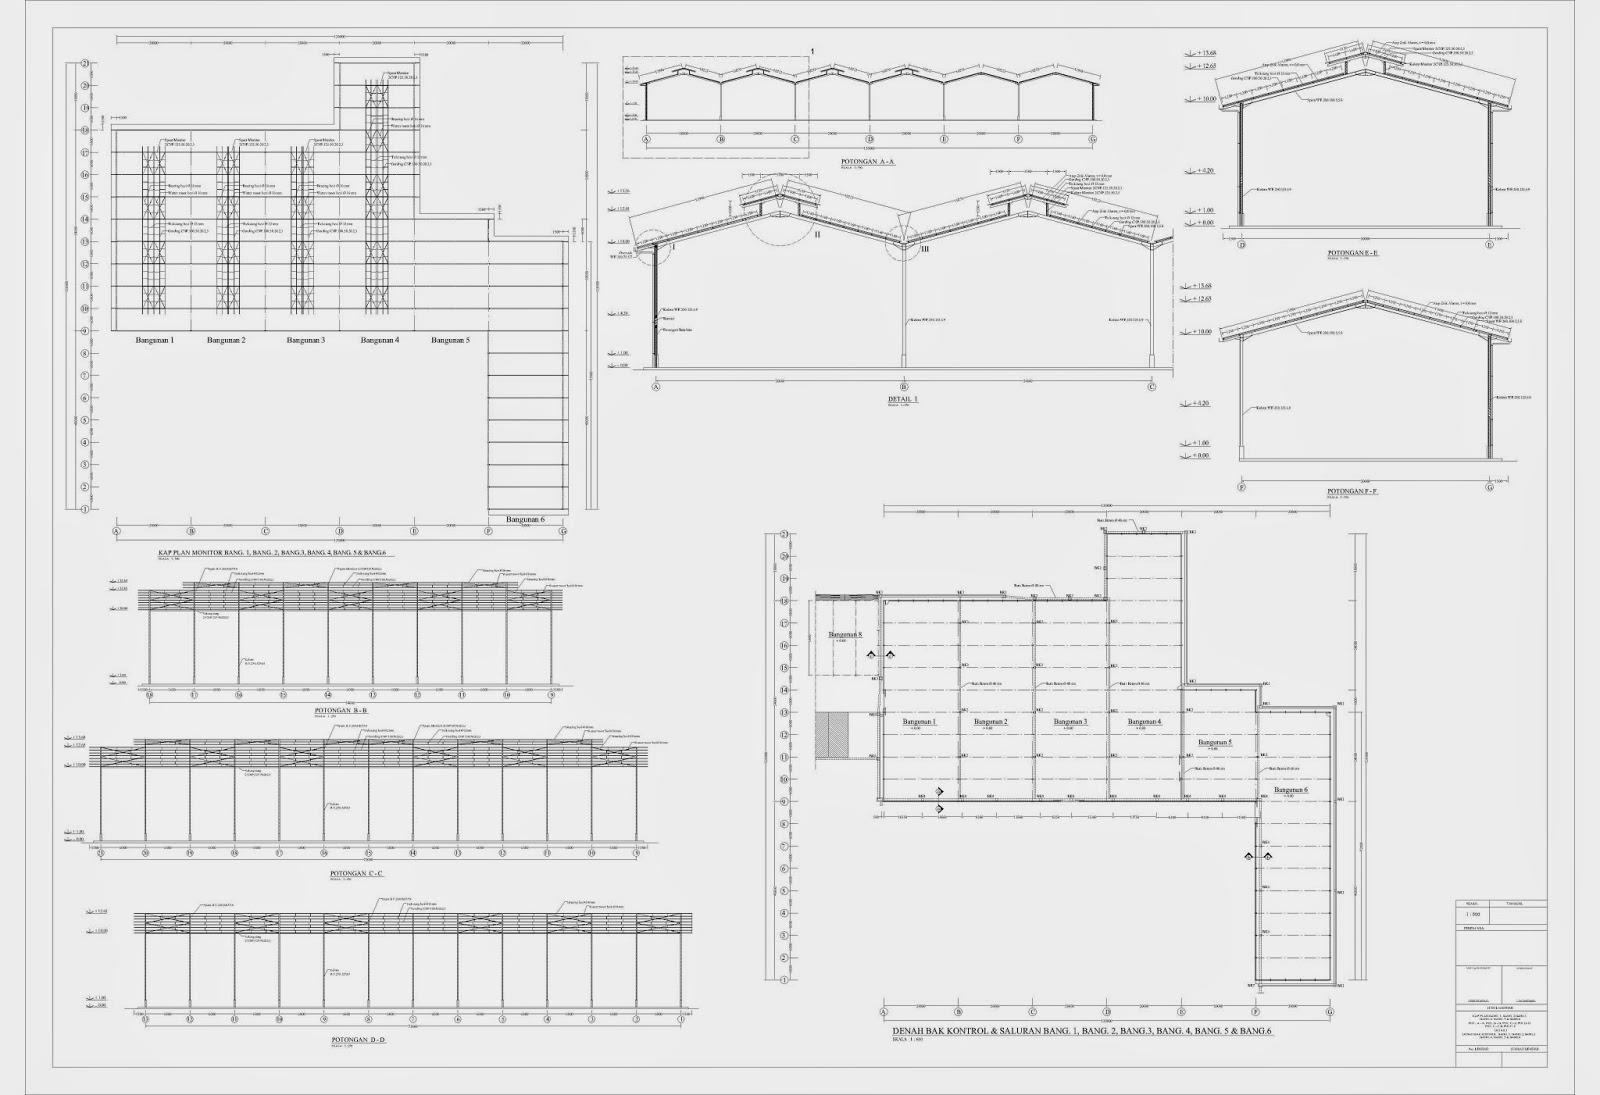 bowie workshop.dump-truck: blueprint konstruksi baja